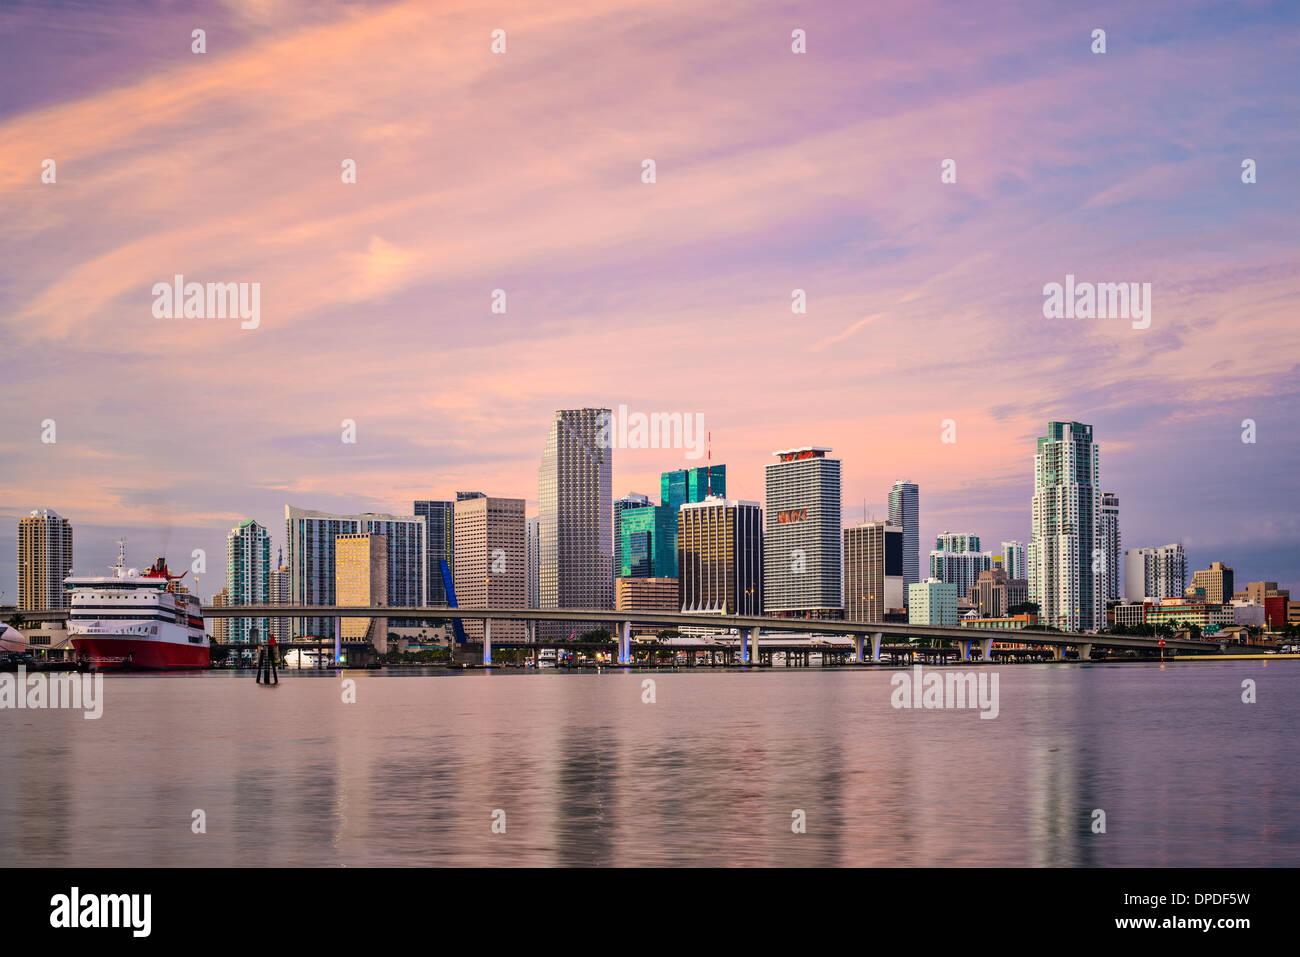 Miami, Florida, USA downtown skyline at dawn. - Stock Image